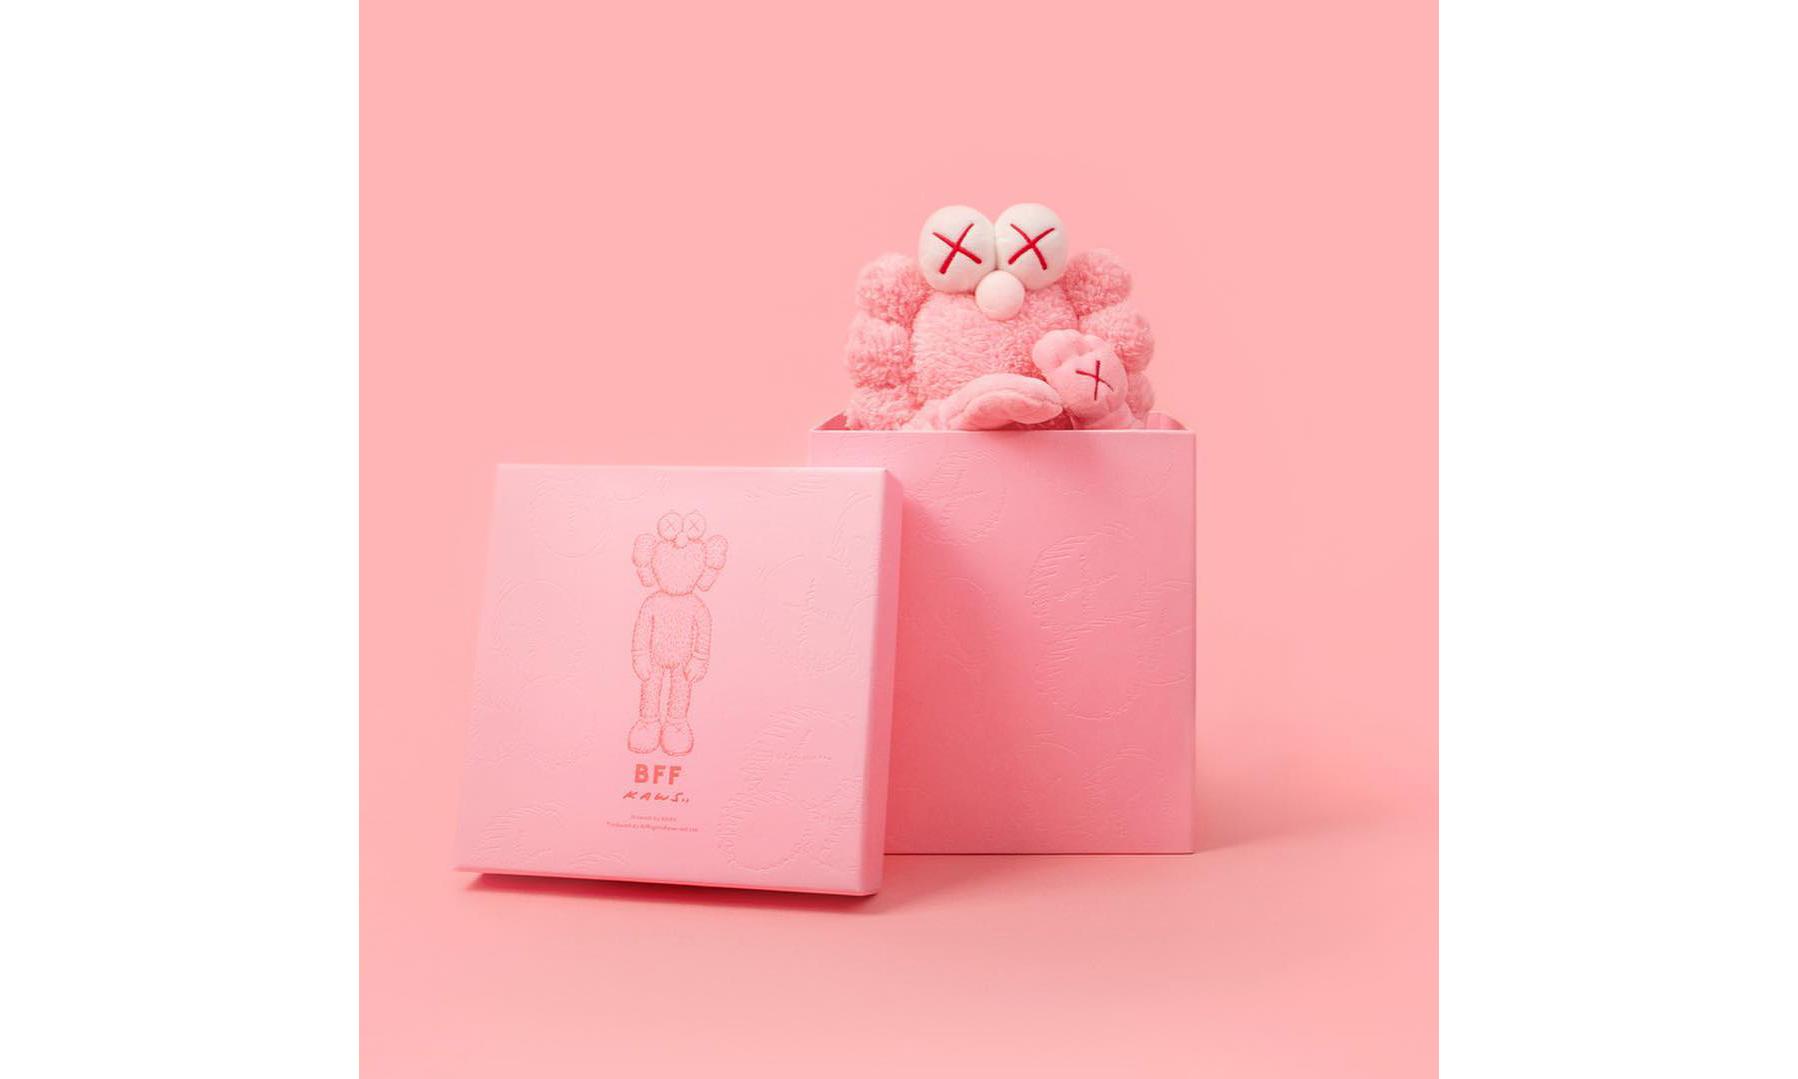 Dior 亲民版?KAWS 宣布粉色 BFF 毛绒玩偶将于明日发售